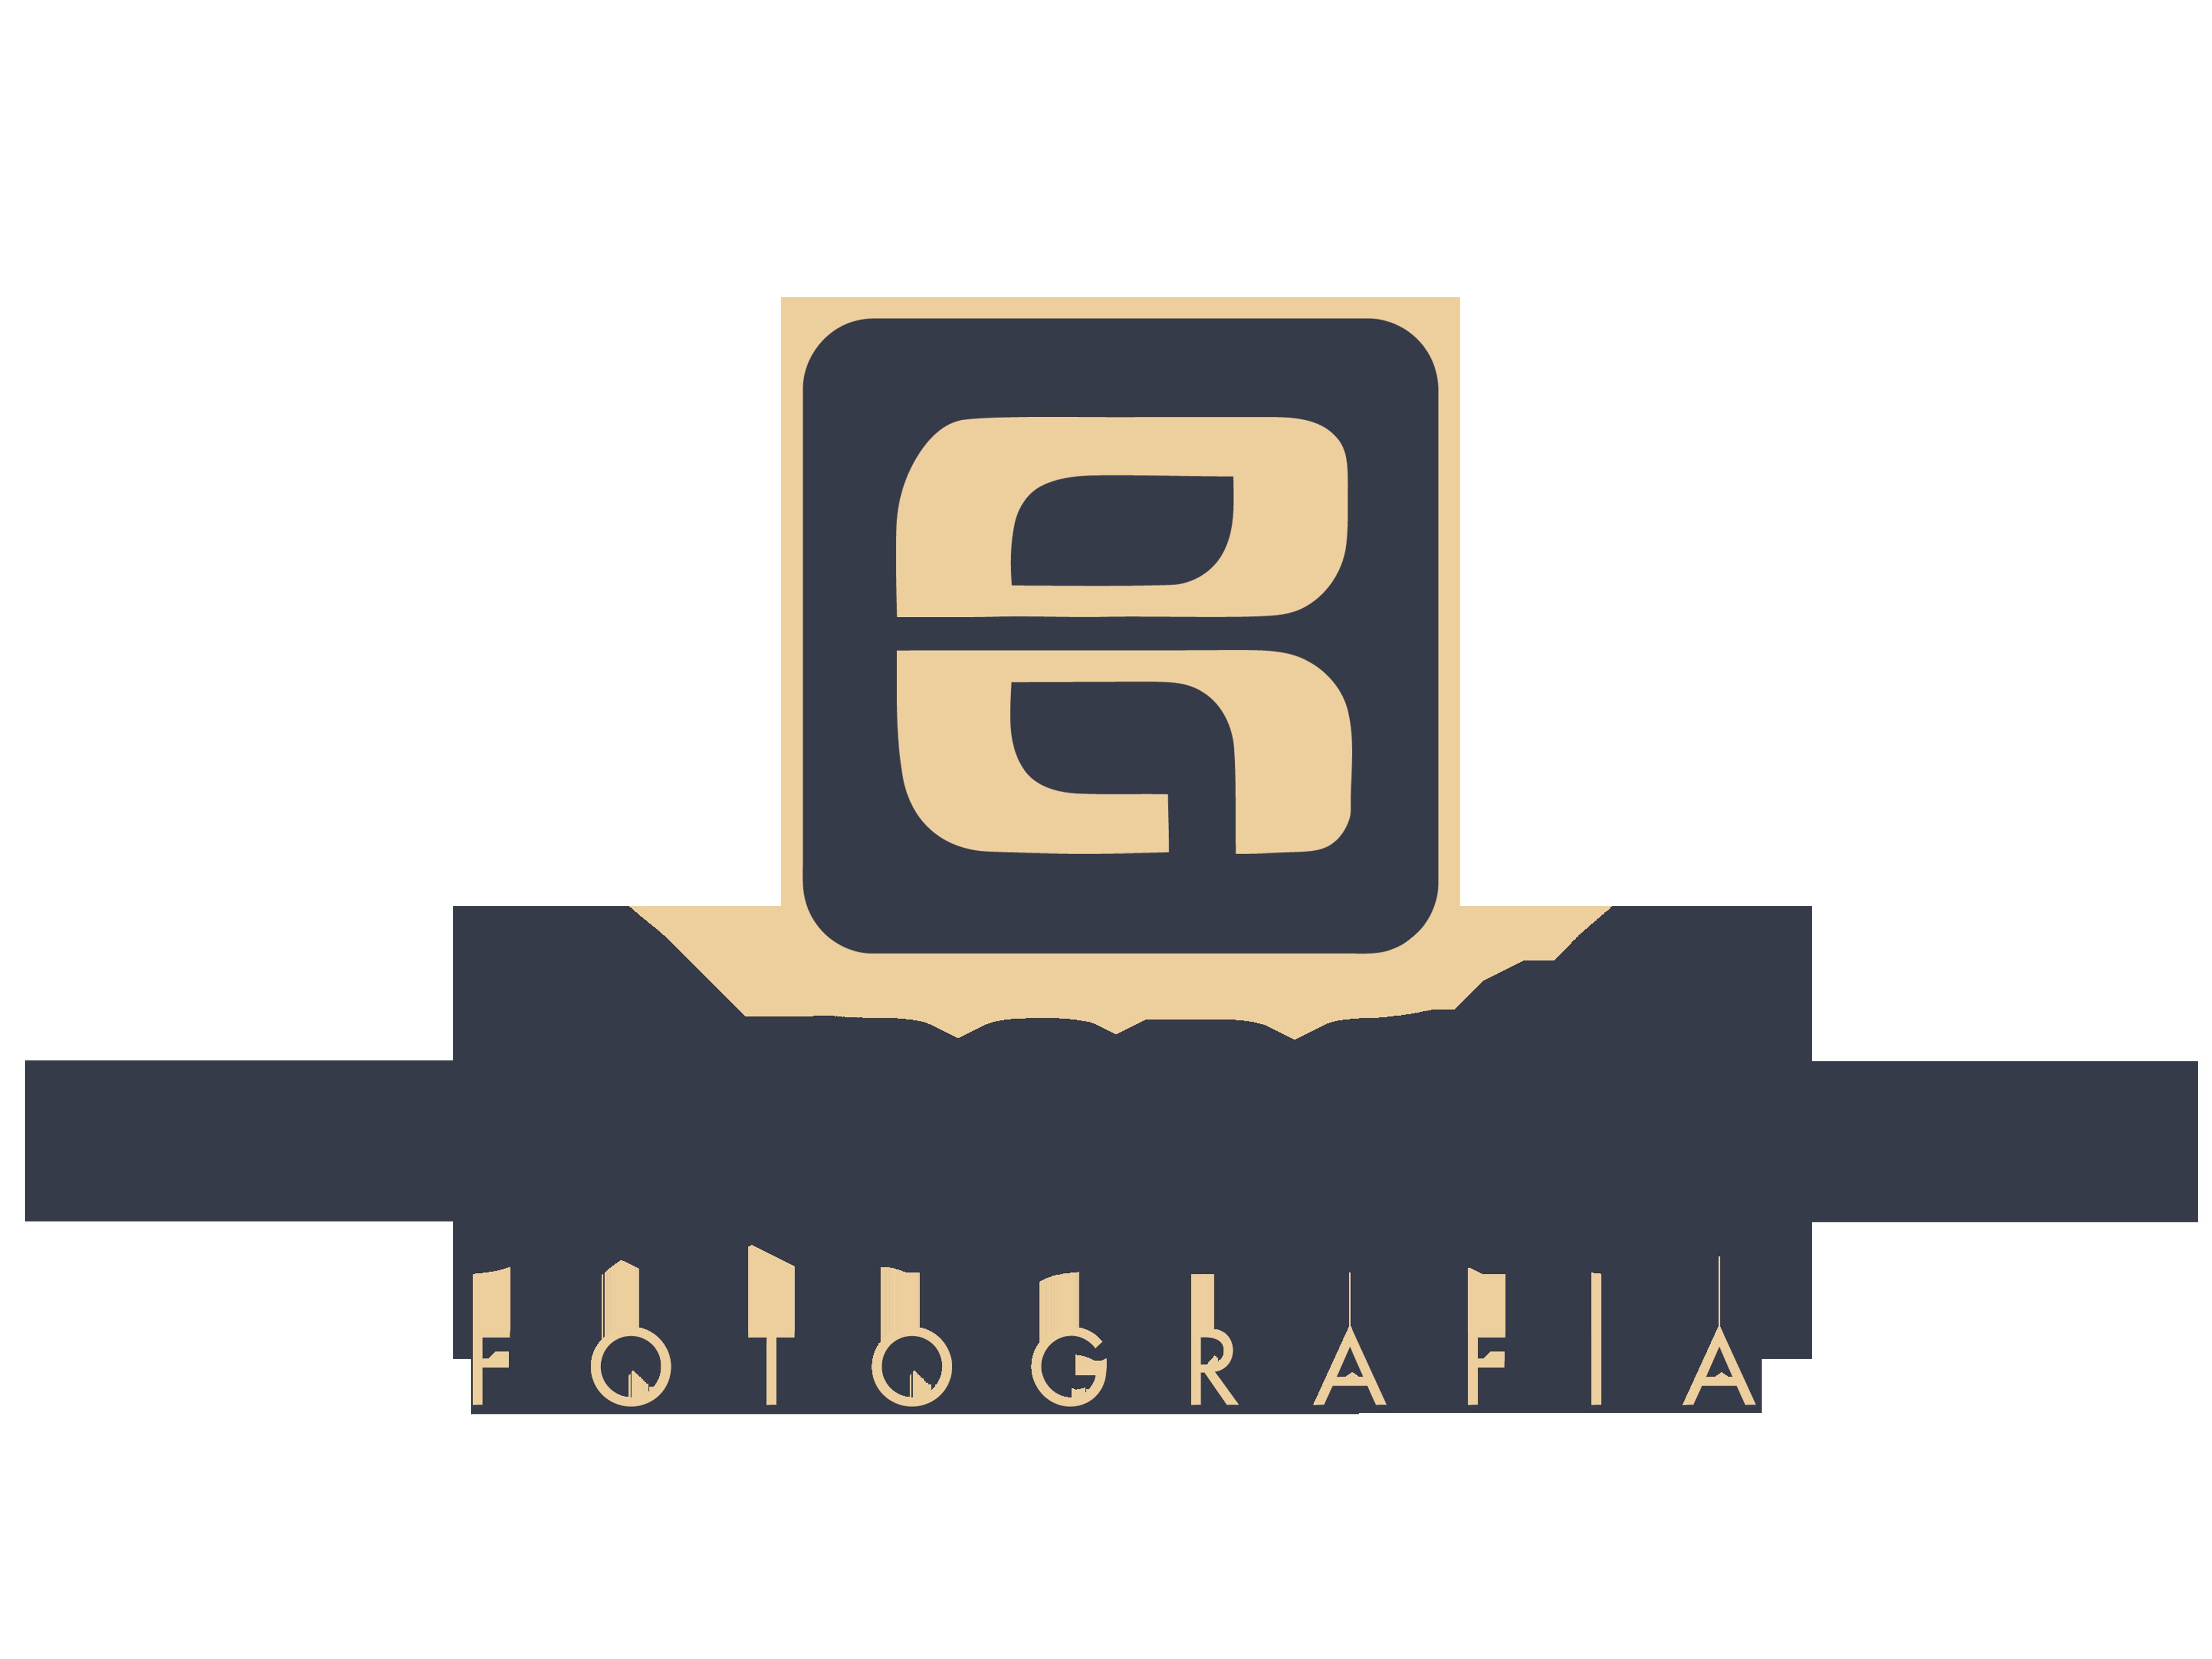 Eder Rodrigues